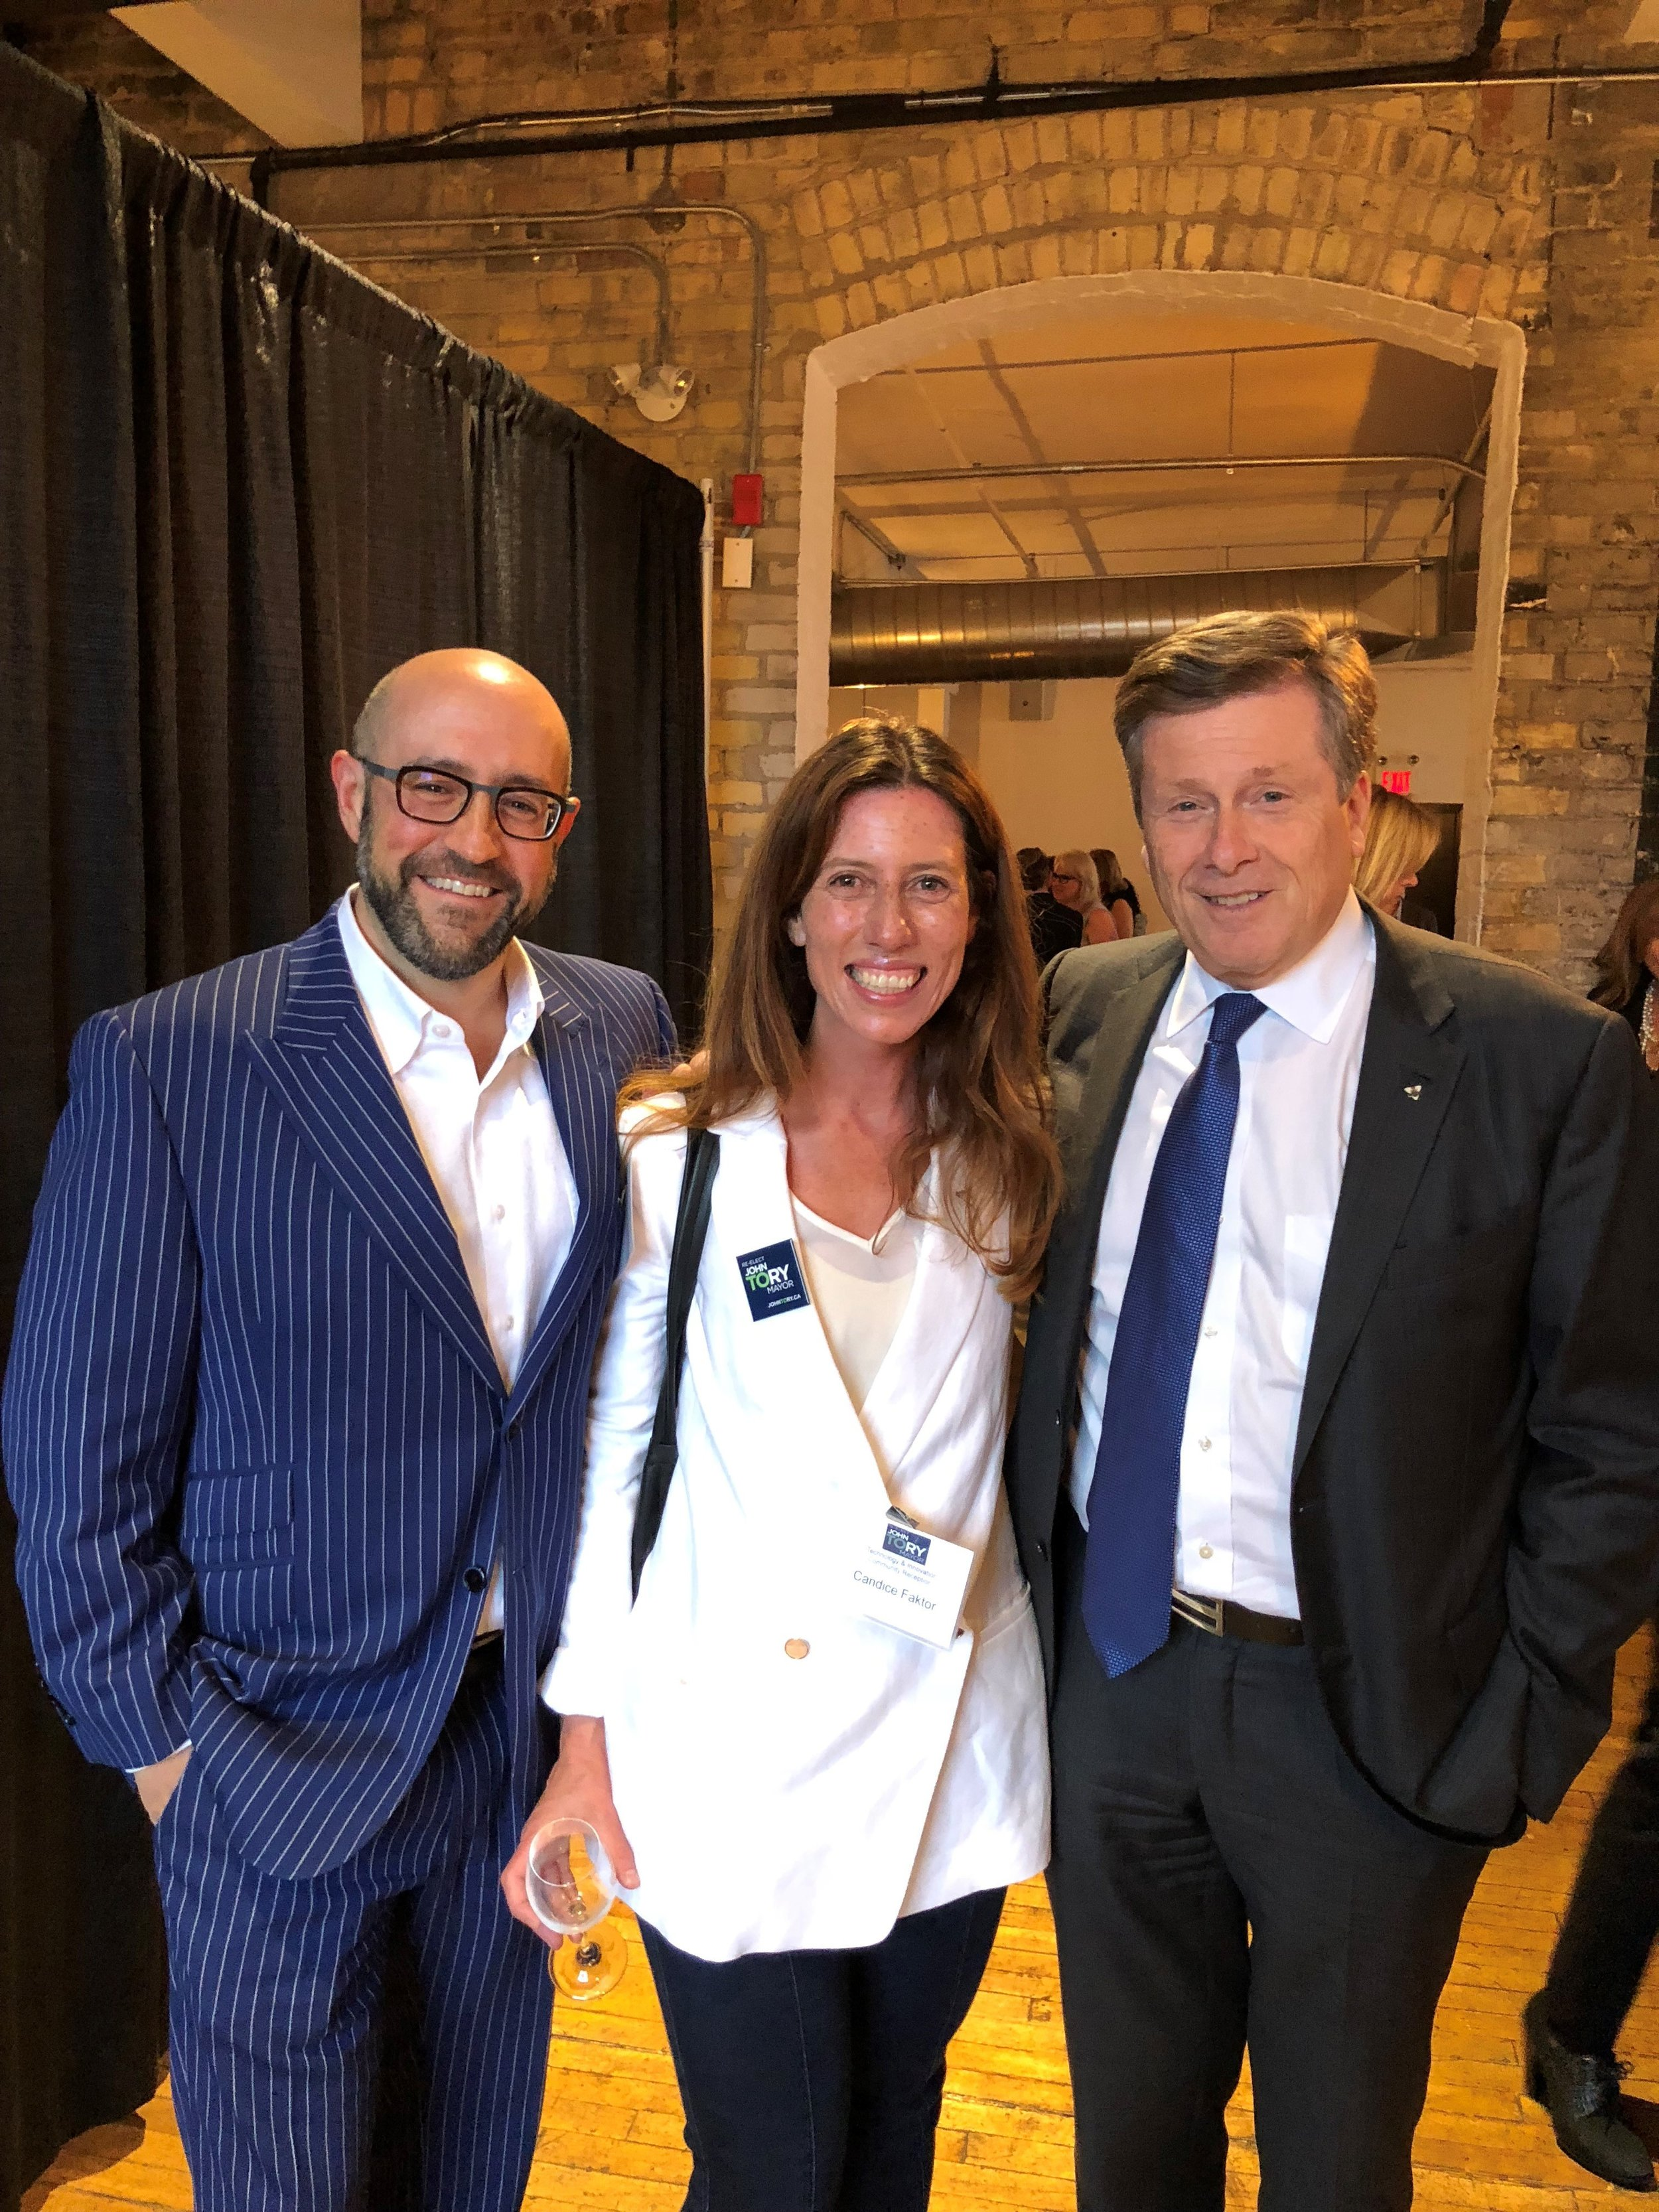 RCI - Jay Rosenzweig, Candice Faktor and Toronto Mayor John Tory 20180920.jpg